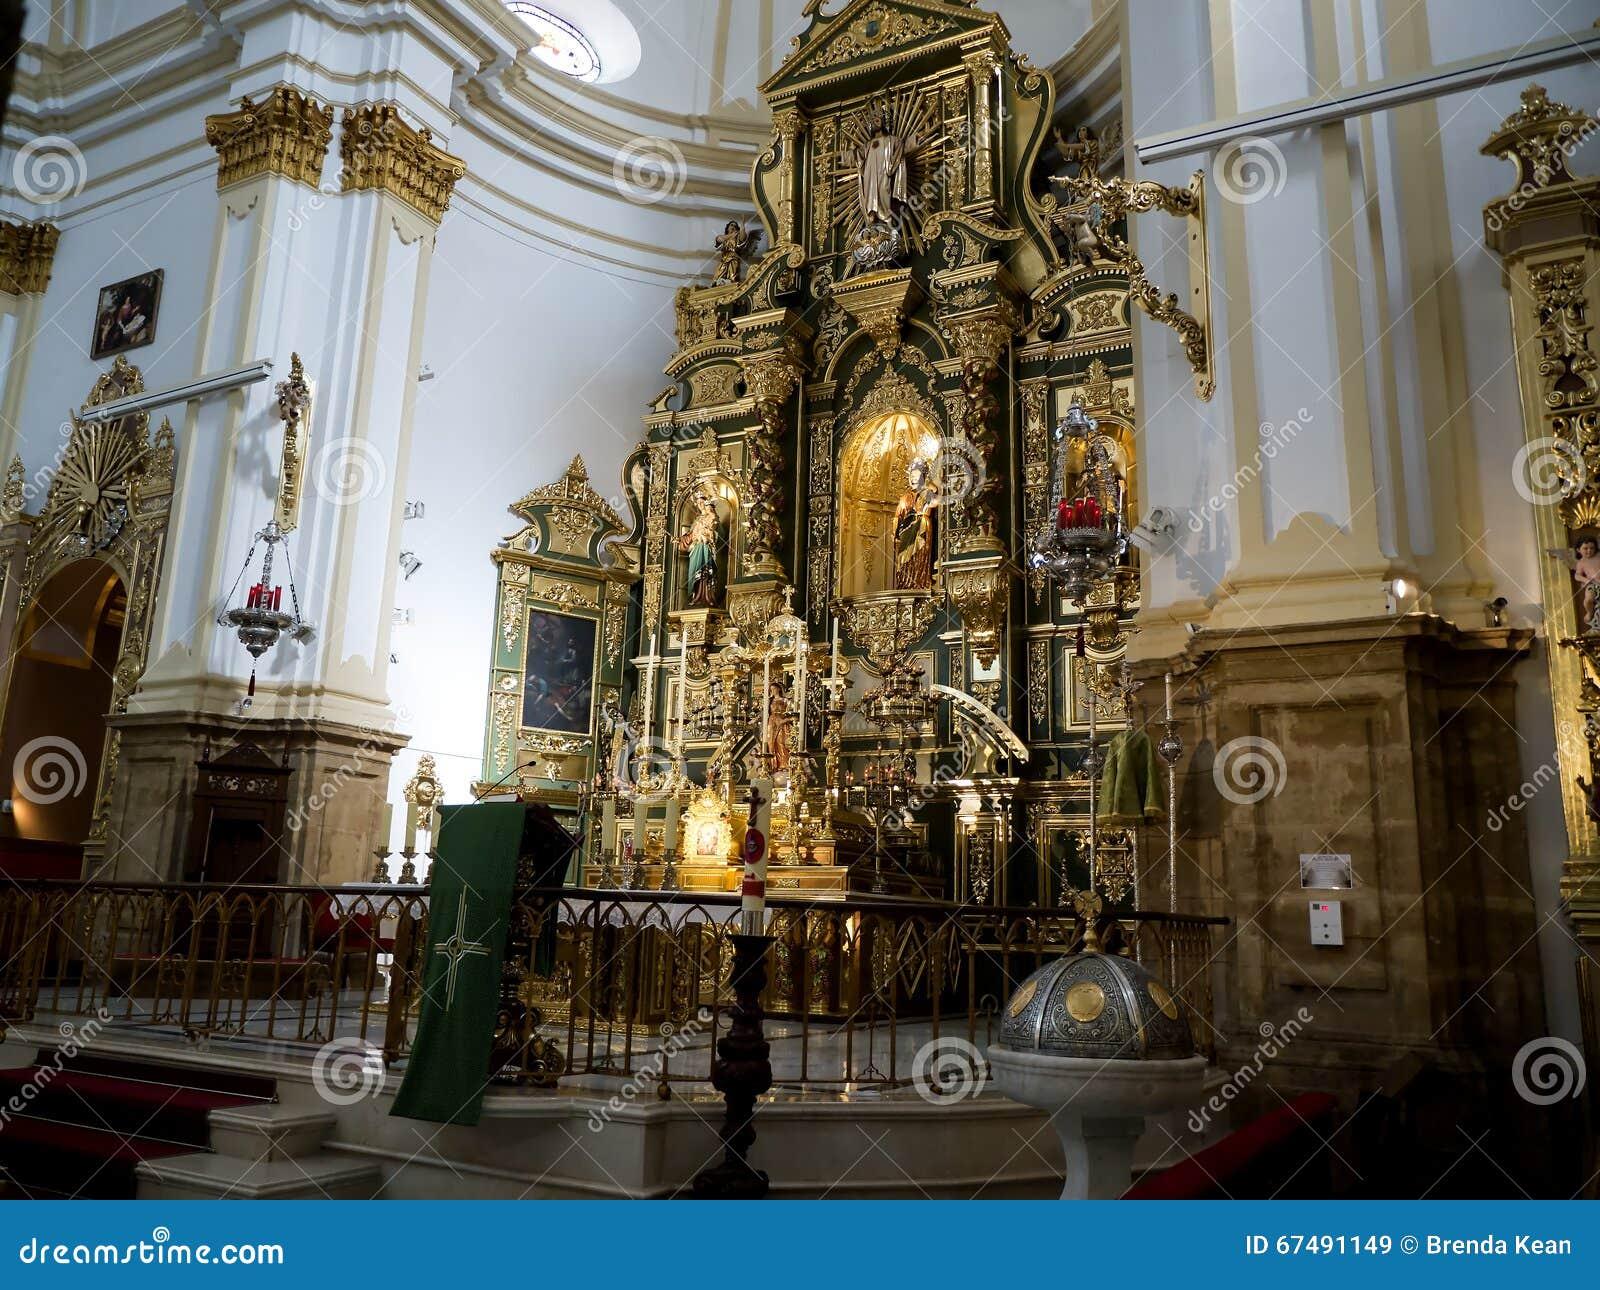 Parish Church in the Stylish Town of Marbella on the Costa del Sol Spain